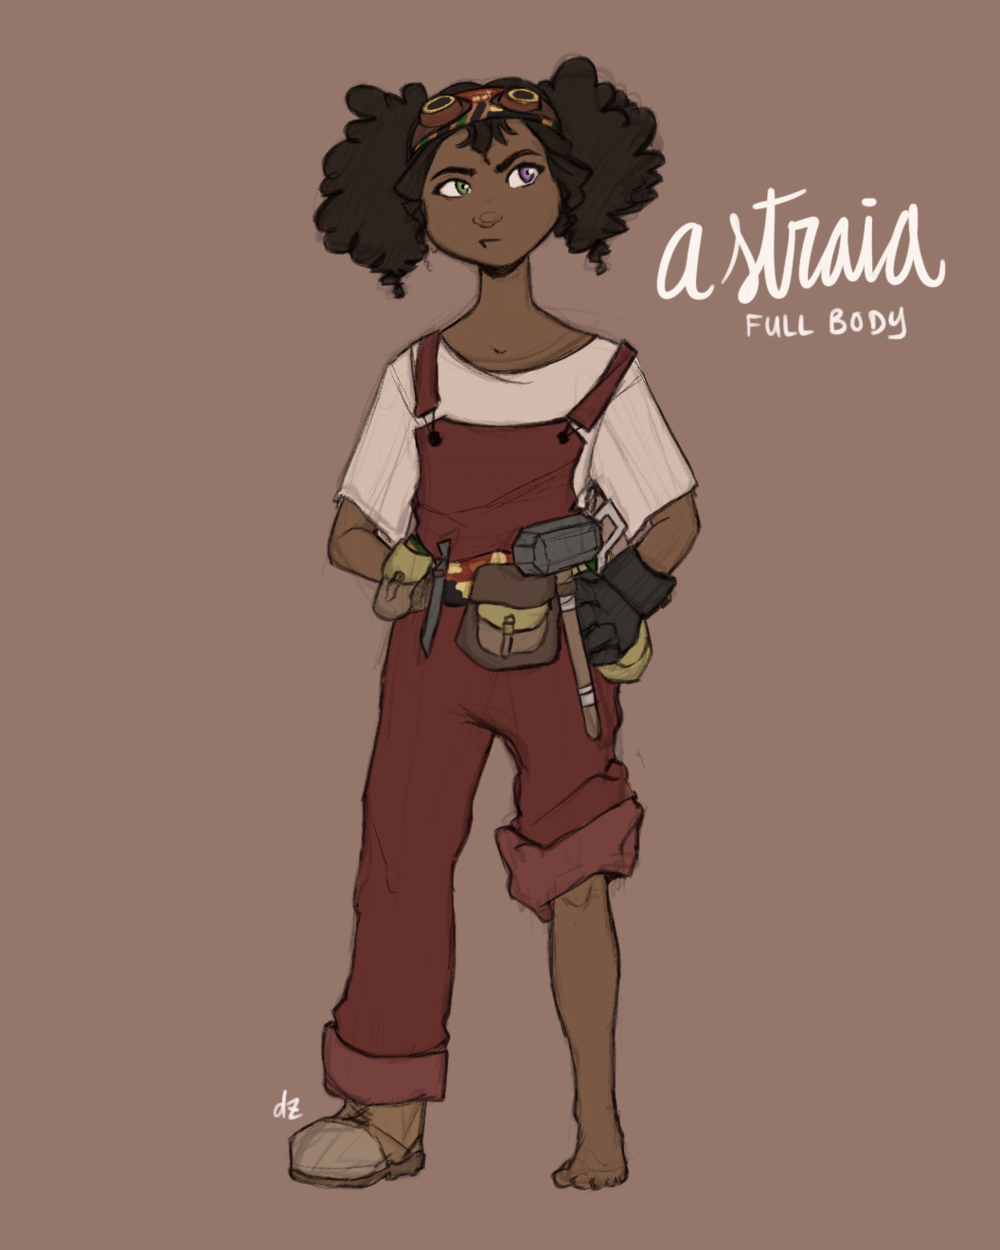 Astraia Nana Abena